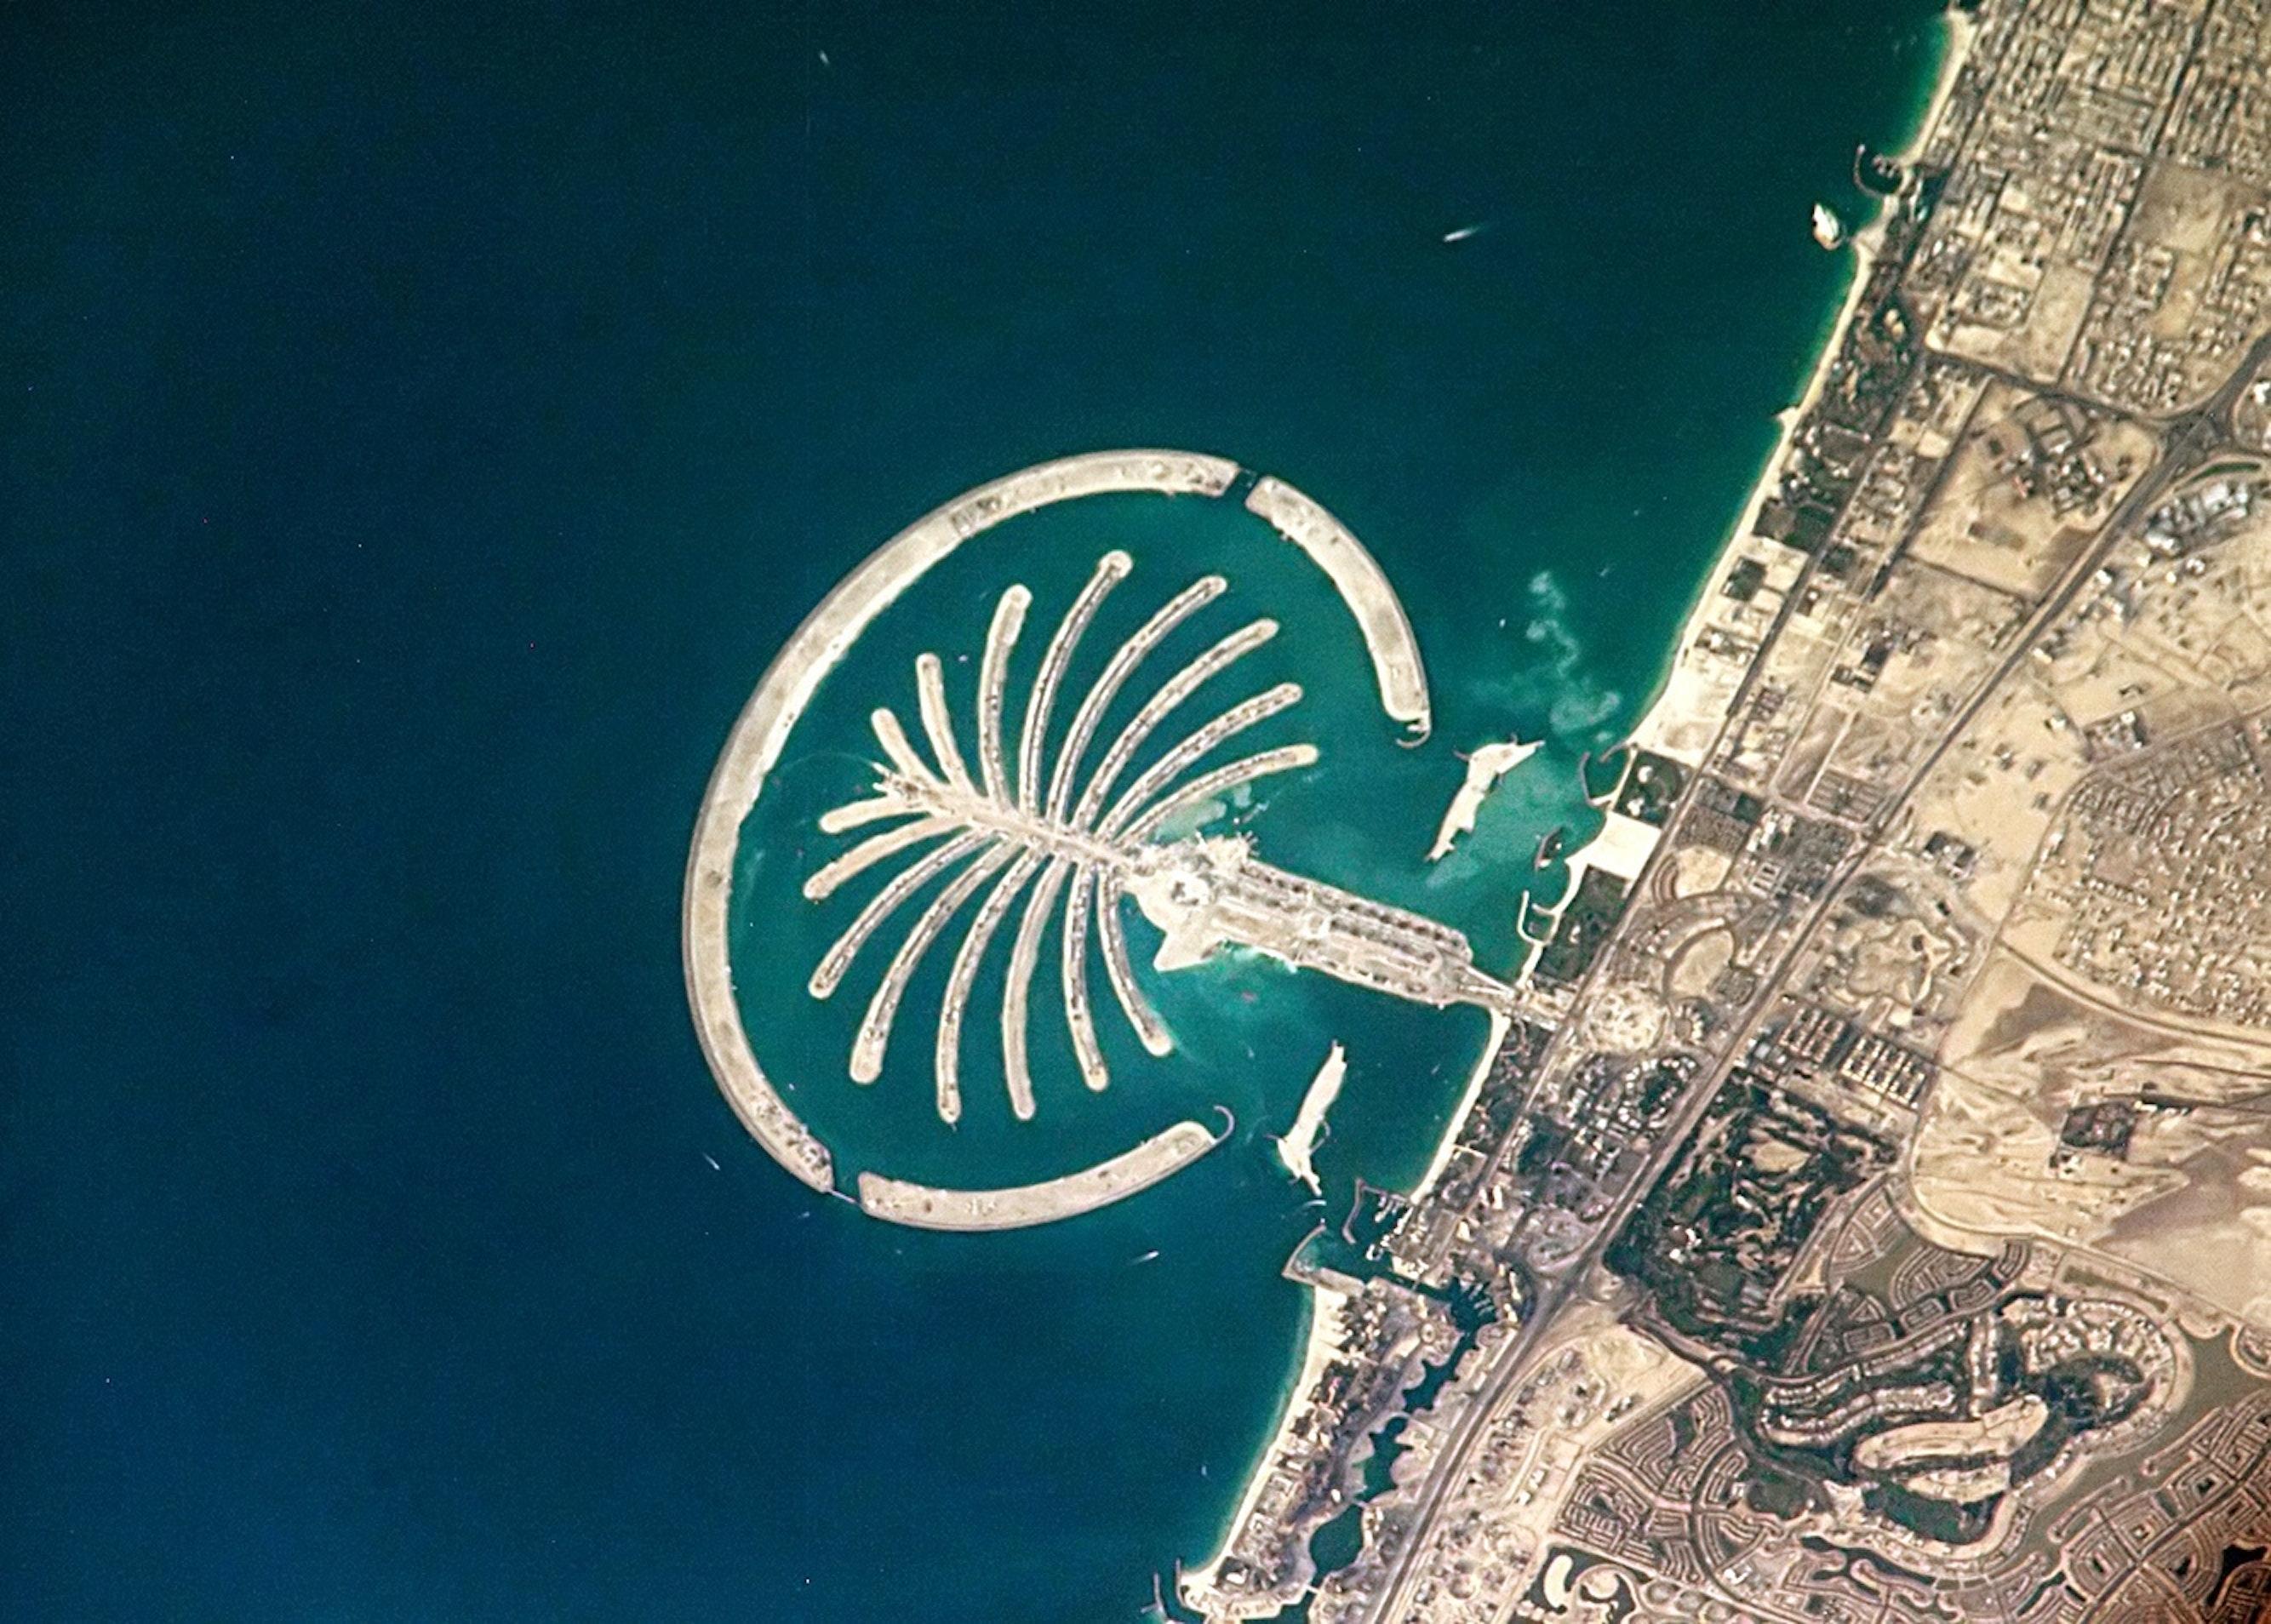 Dubai's palm islands collectively add more than 300 miles to Dubai's coastline.